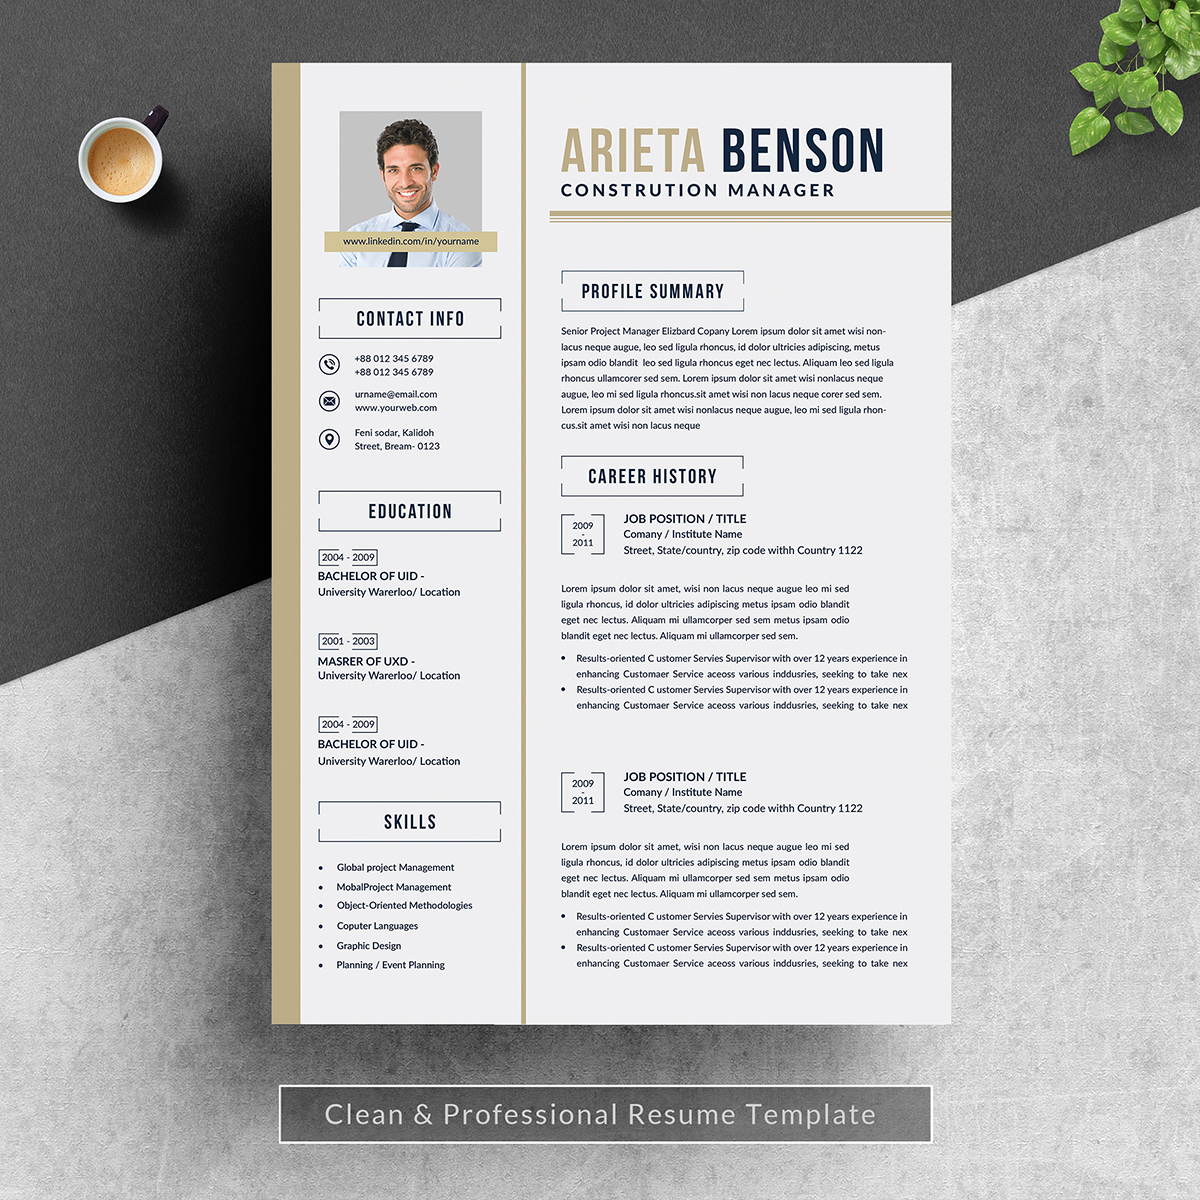 Arieta Benson Resume Template